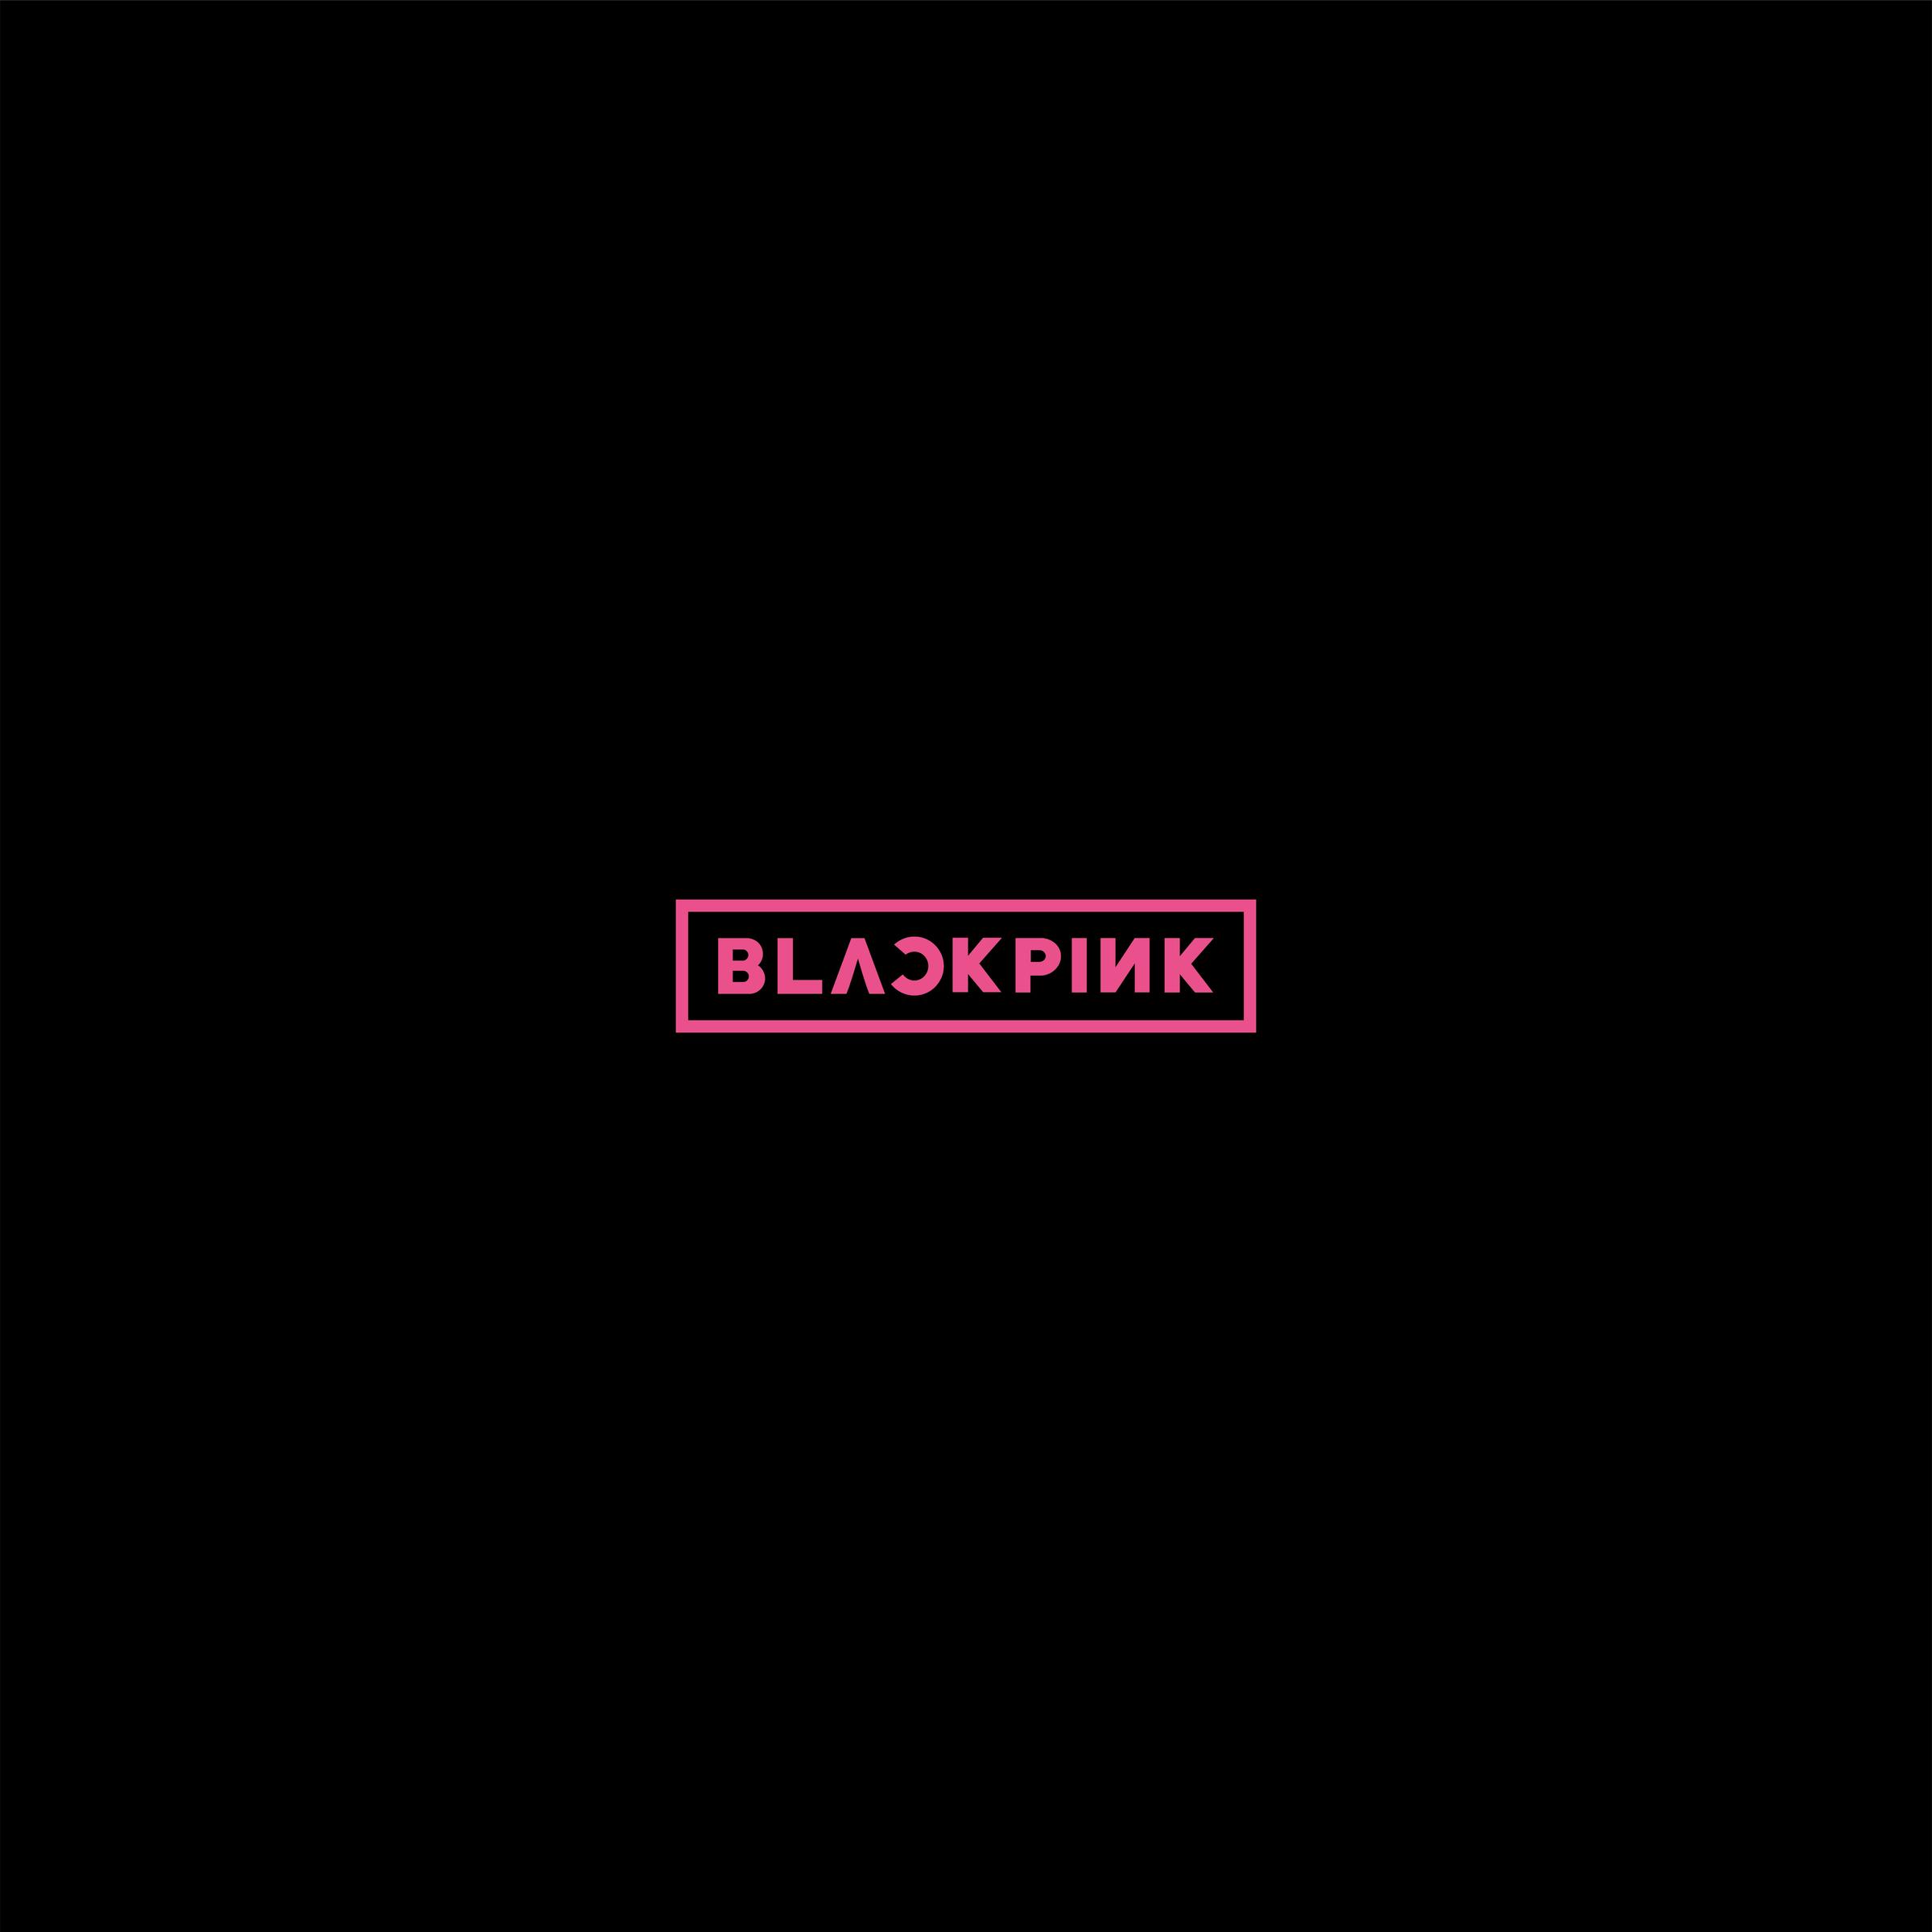 BLACKPINK (album)